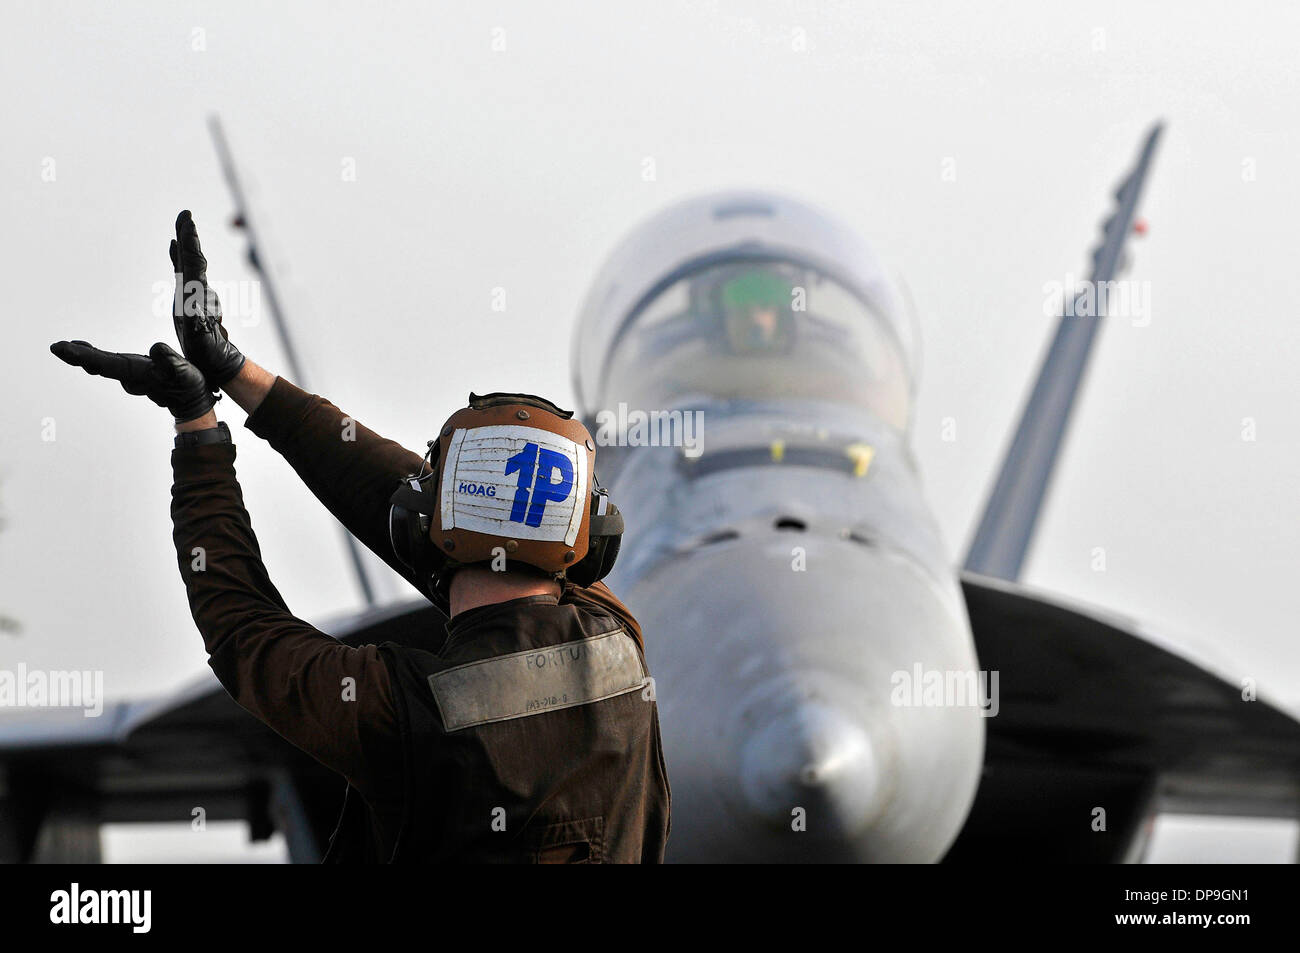 U.S. Navy Airman signals to the pilot of an F/A-18F Super Hornet aircraft - Stock Image